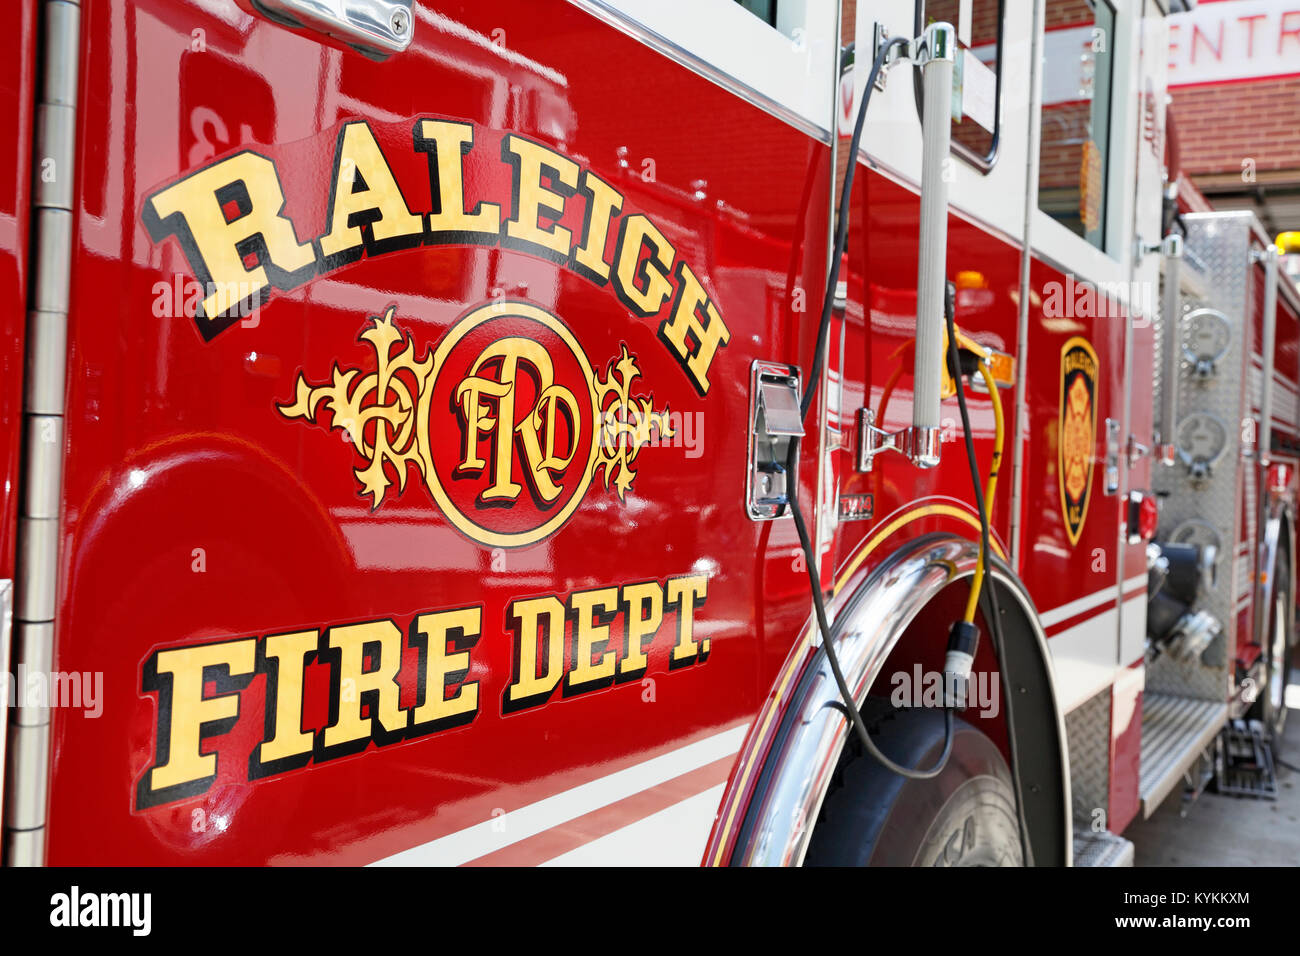 Raleigh Fire Department fire truck closeup, North Carolina. Stock Photo